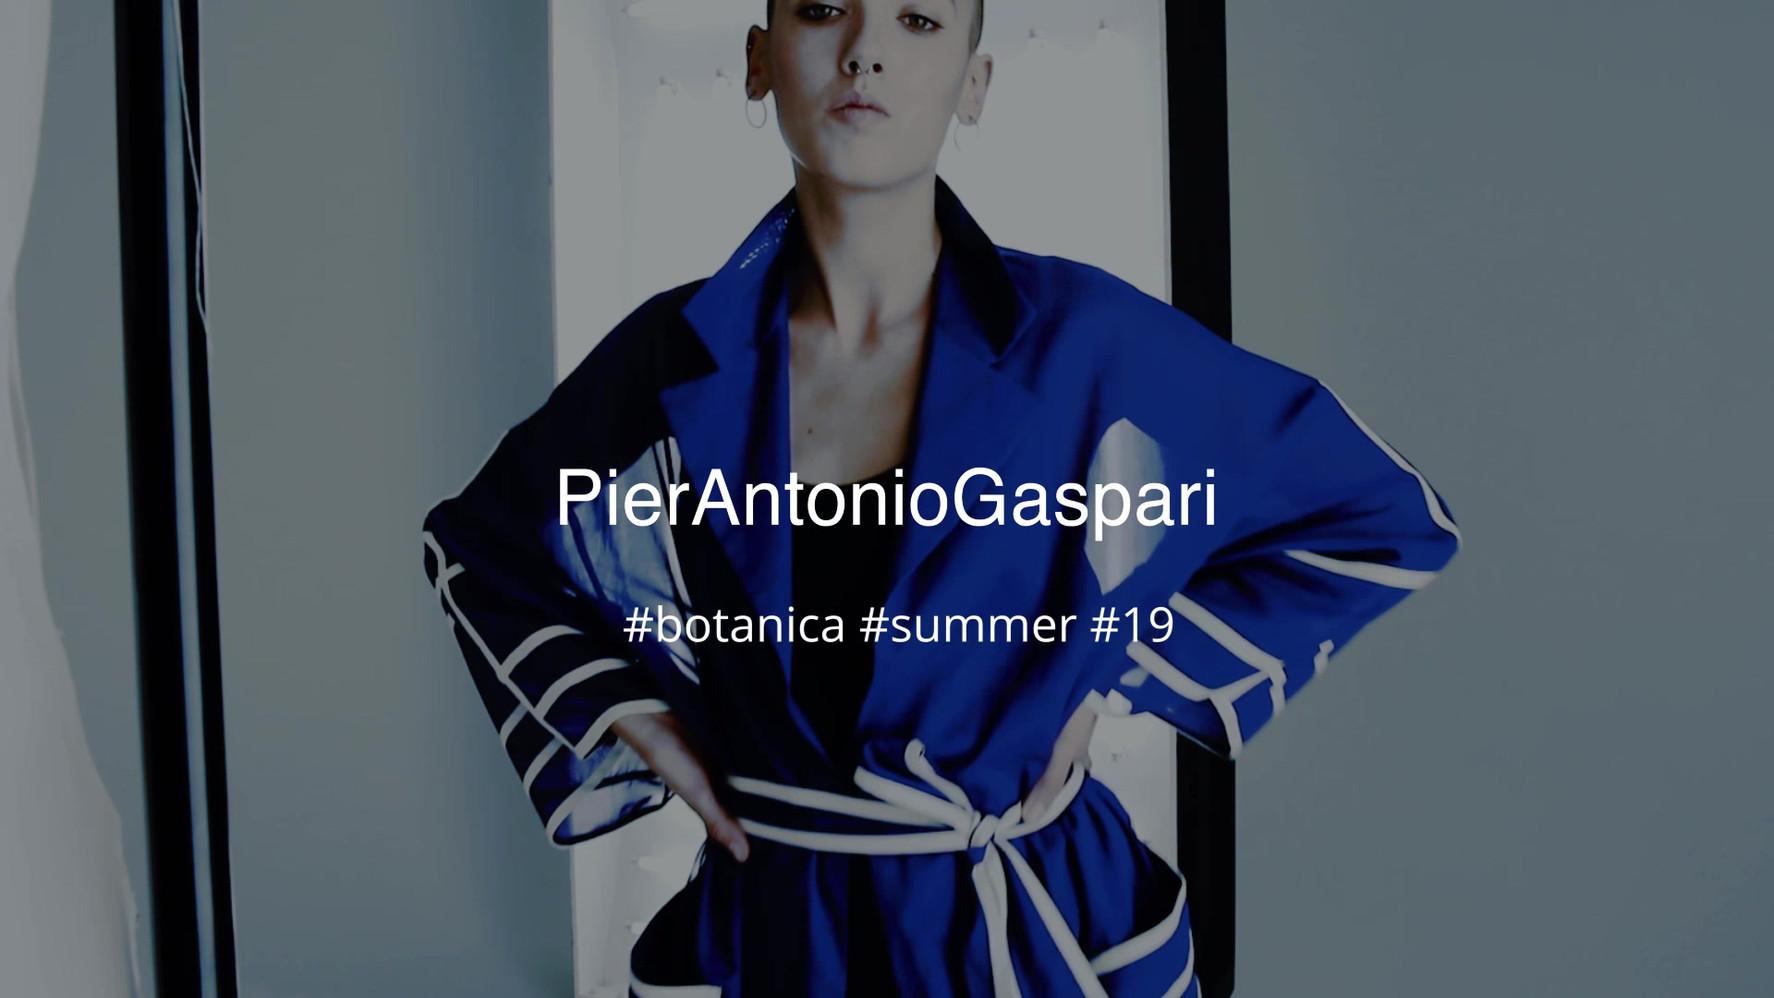 Anna Bertozzi - Director and Sound www.annabertozzi.com PierAntonioGaspari  -Stylist  Produced - Lazagne magazine Fashion assistant - Elisa Bacchi Model - Valeria Caputo